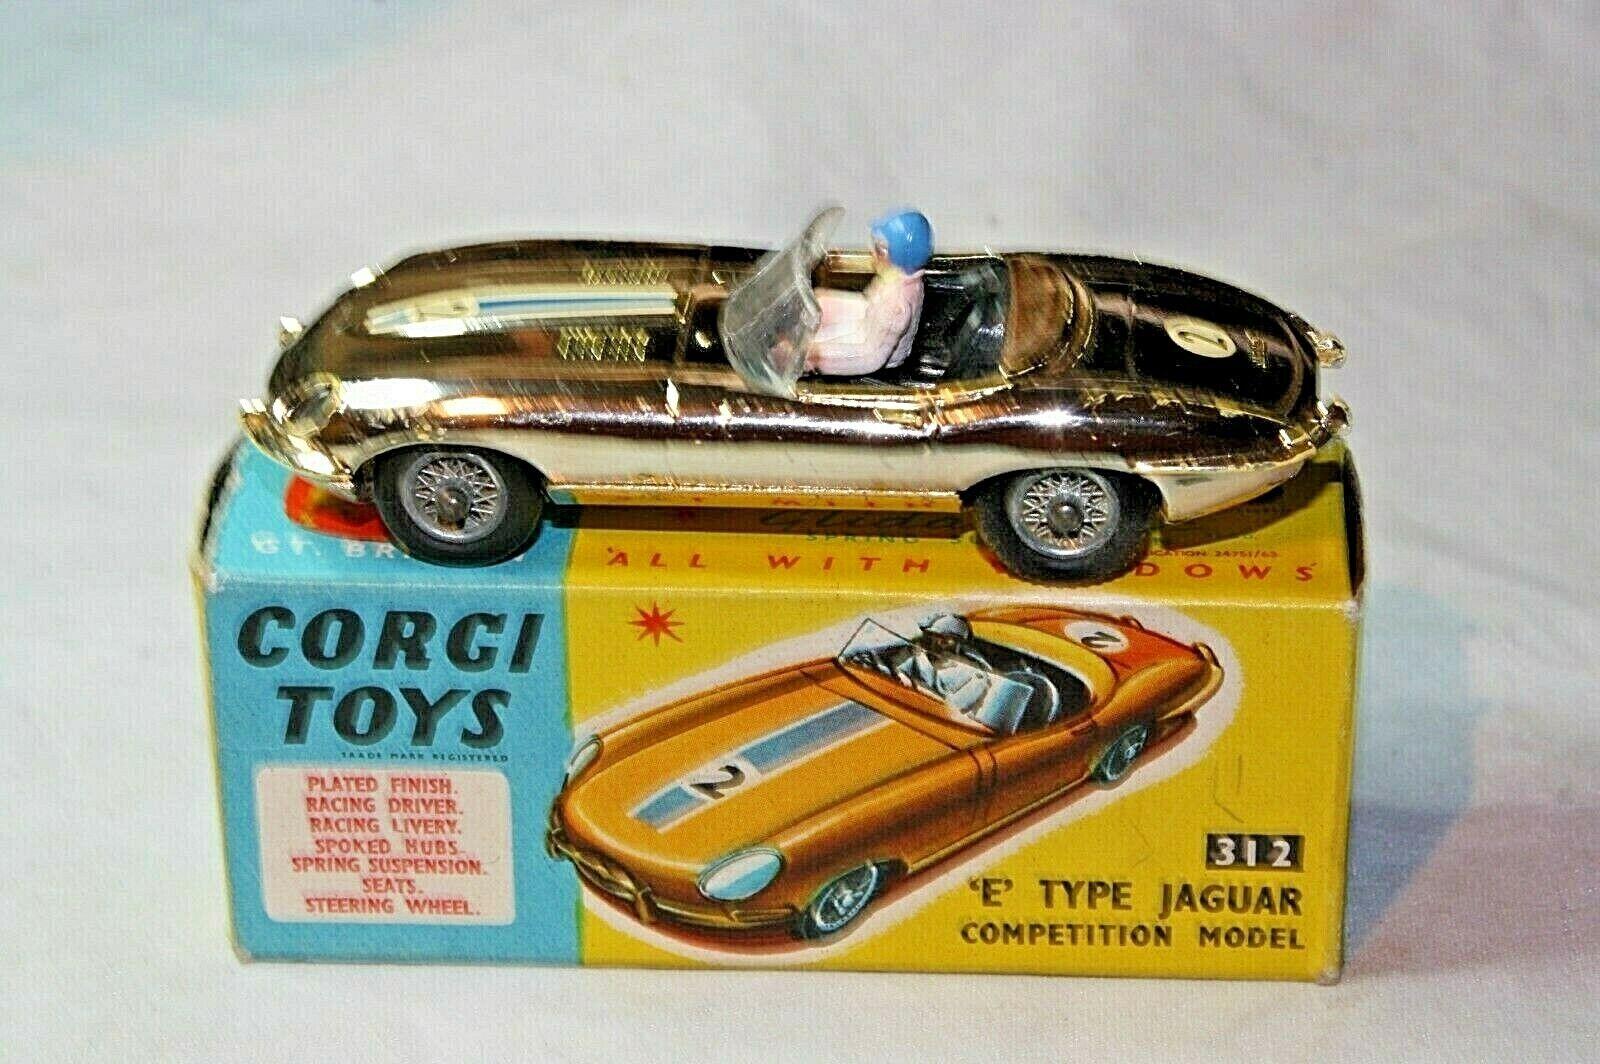 Corgi 312 Jaguar E type Competition Model, Excellent Condition in Original Box